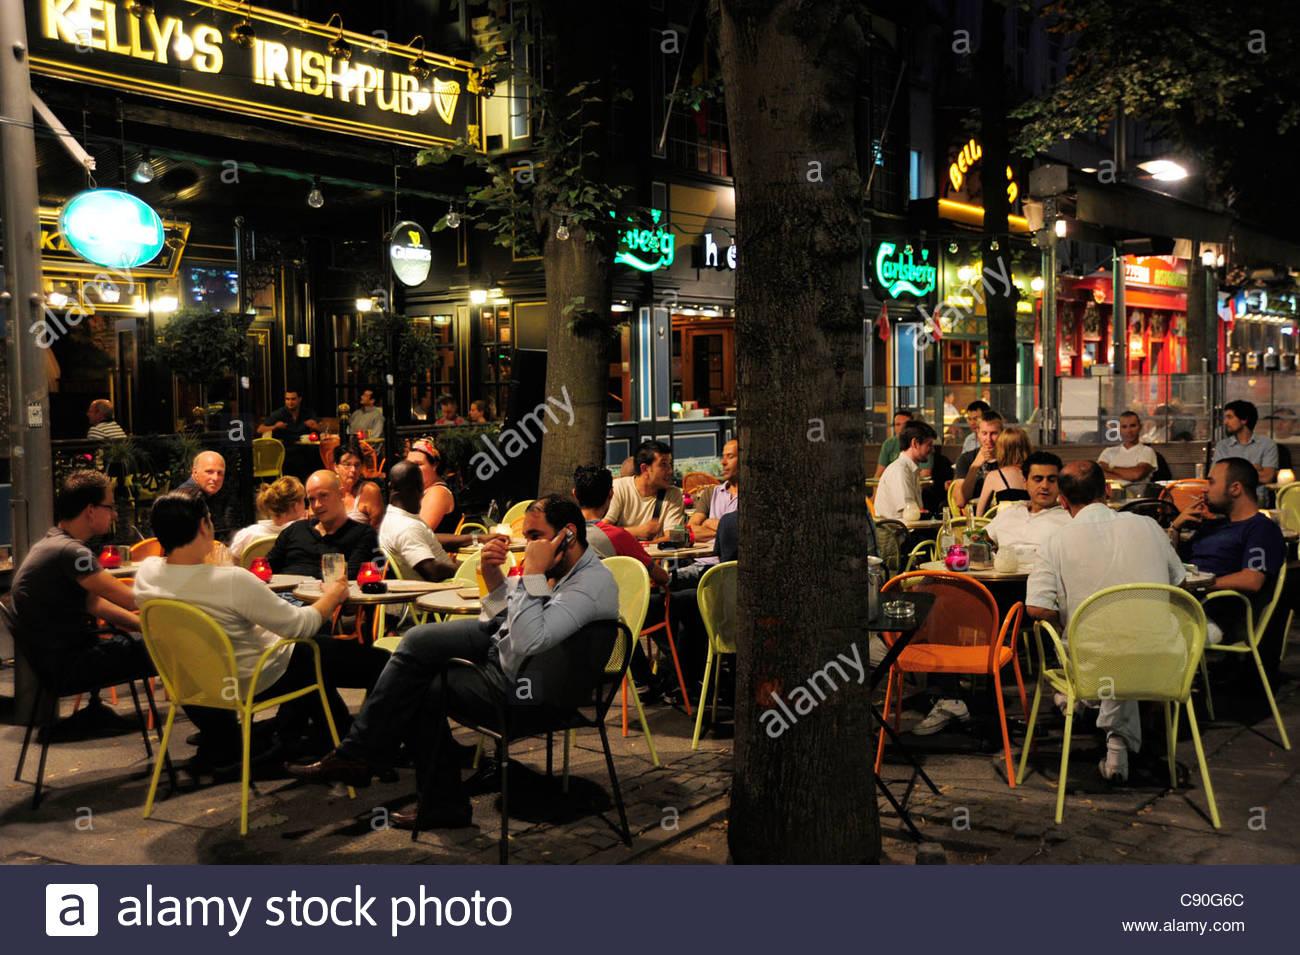 Sidewalk cafe in the evening, De Keyserlei street, city centre, Antwerp, Anvers, Flanders, Belgium, Benelux - Stock Image